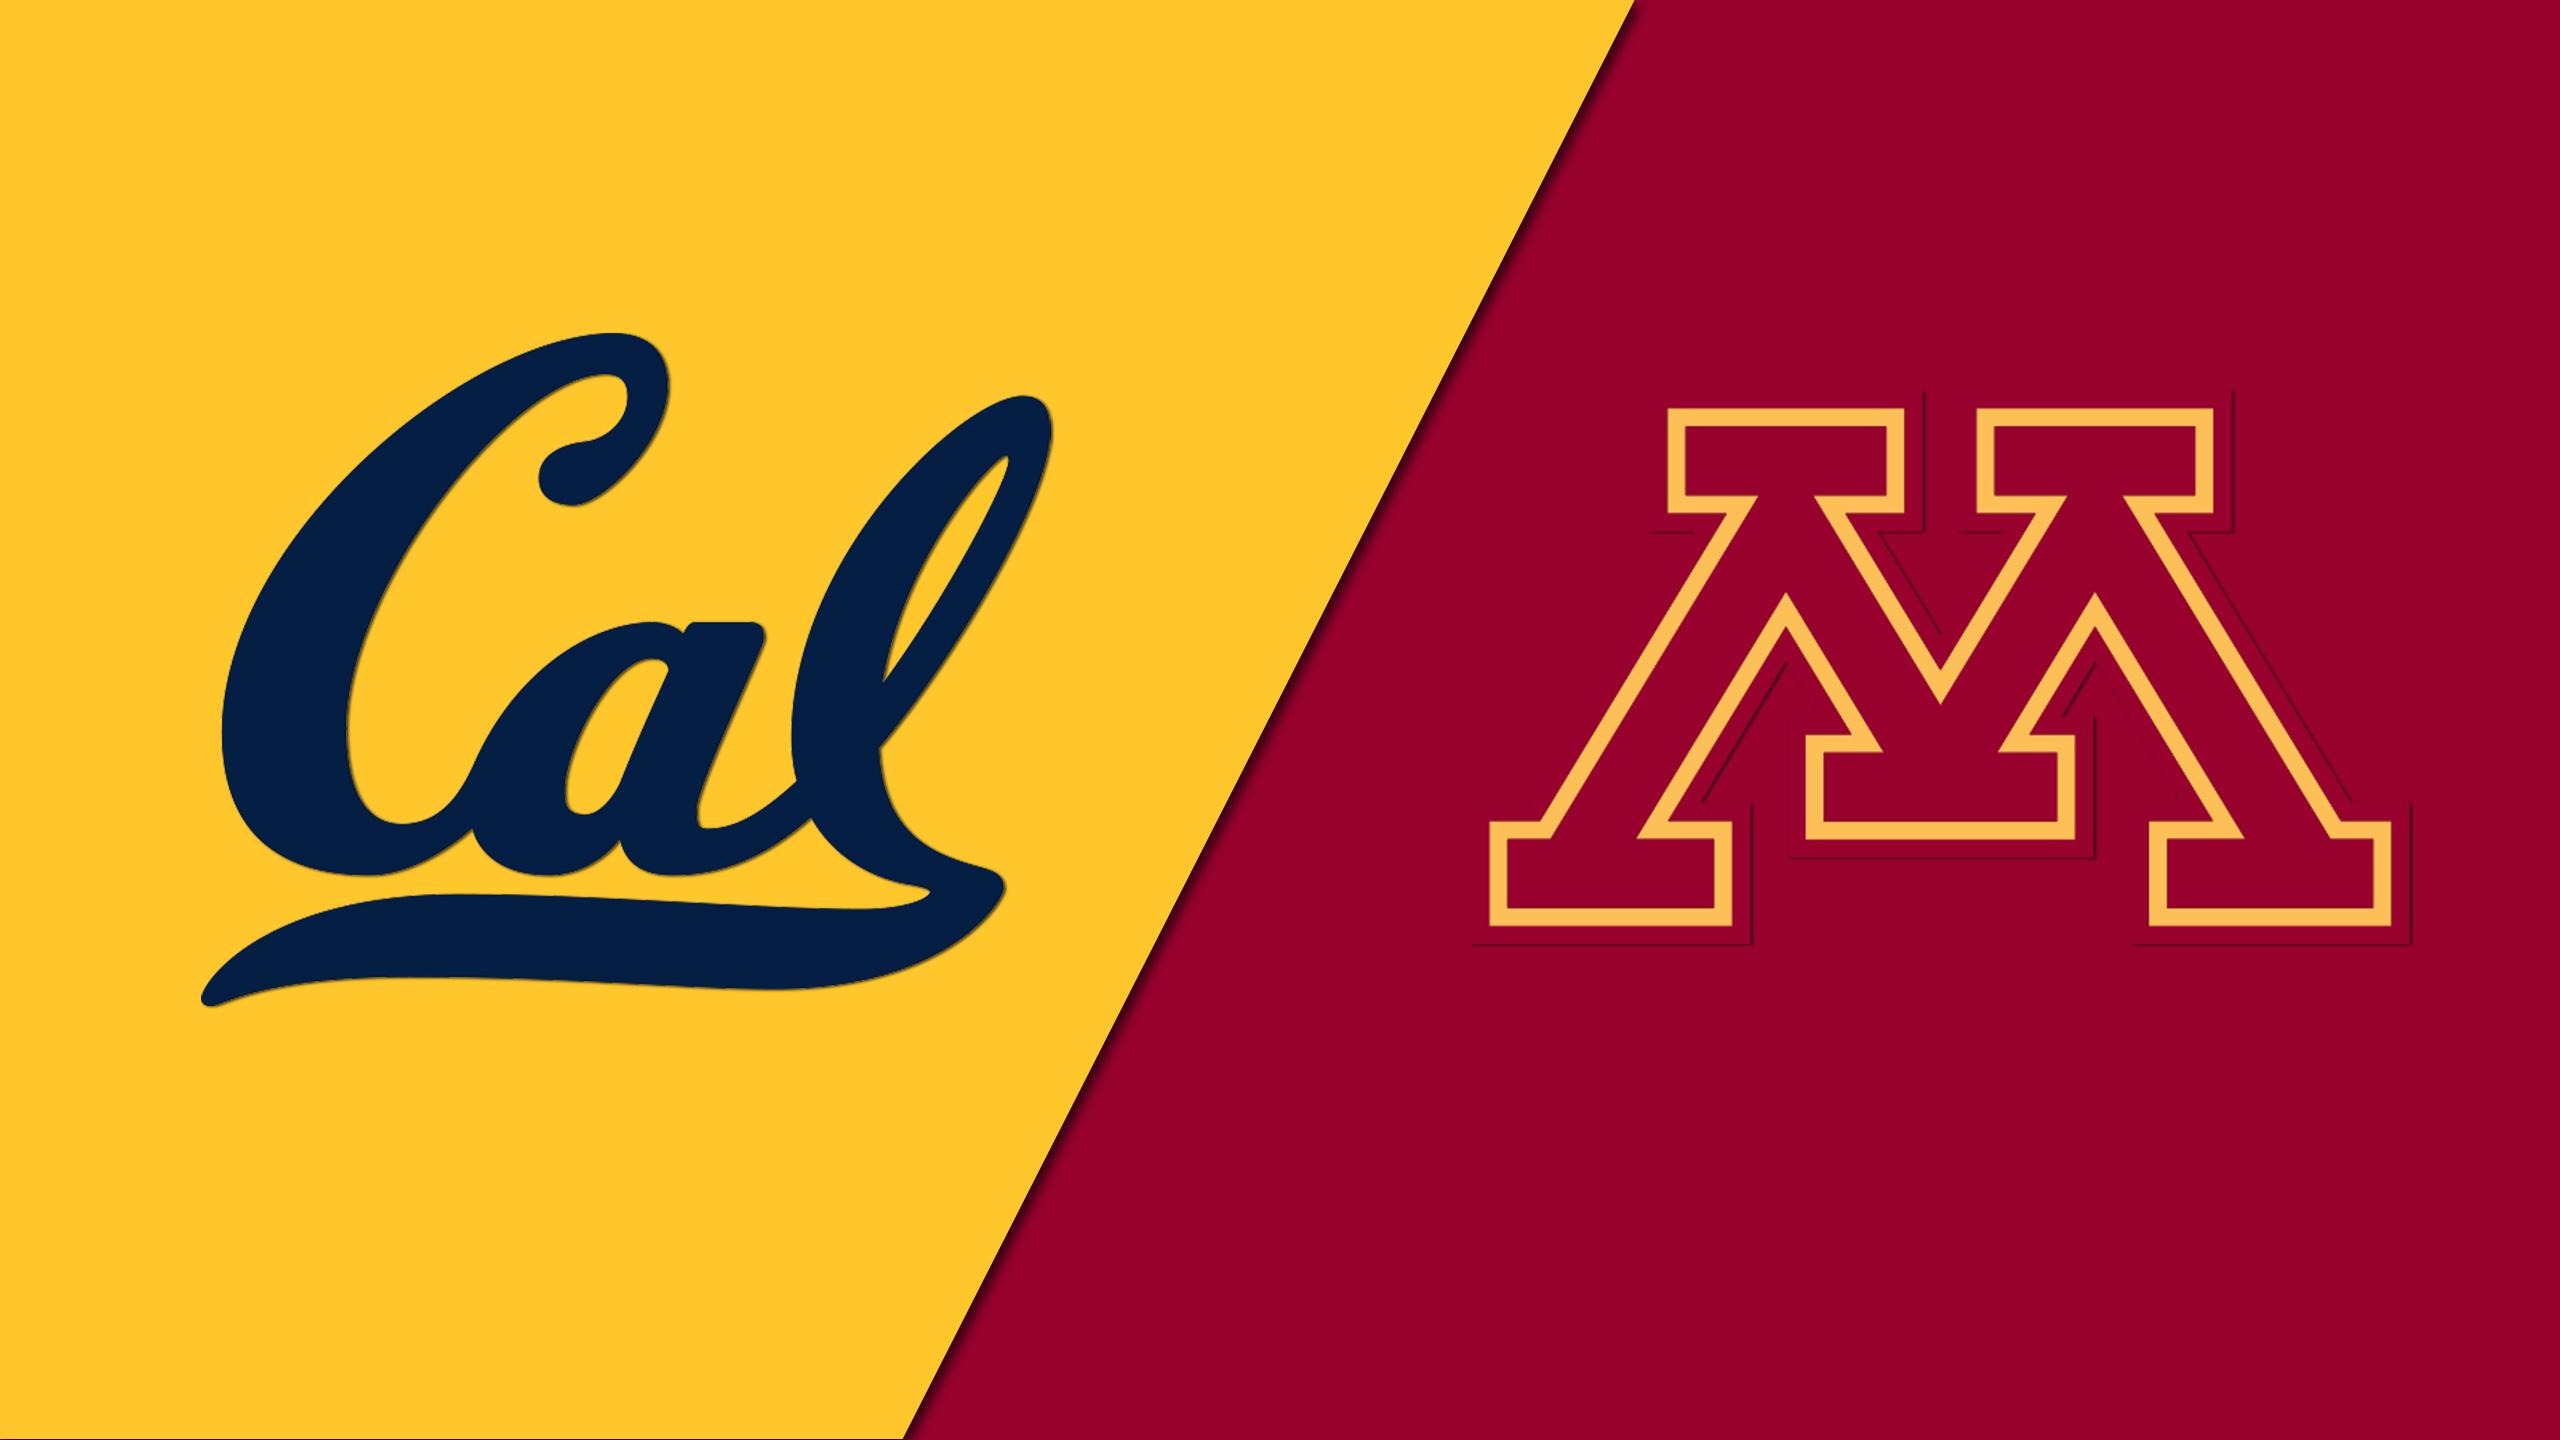 California vs. Minnesota (Softball)